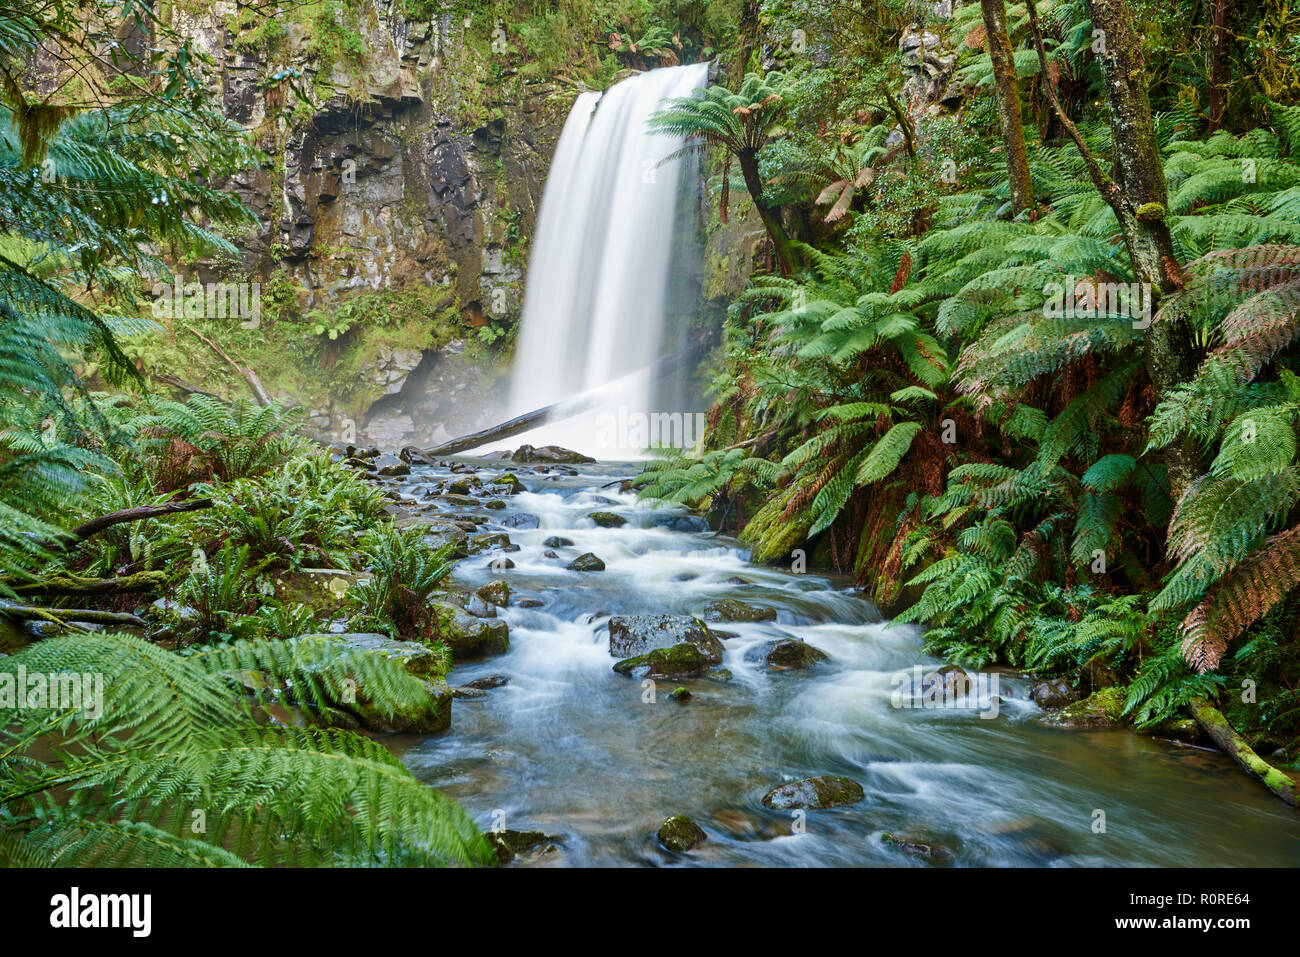 Hopetoun Falls in the rainforest, Great Otway National Park, Otways Region, Australia - Stock Image